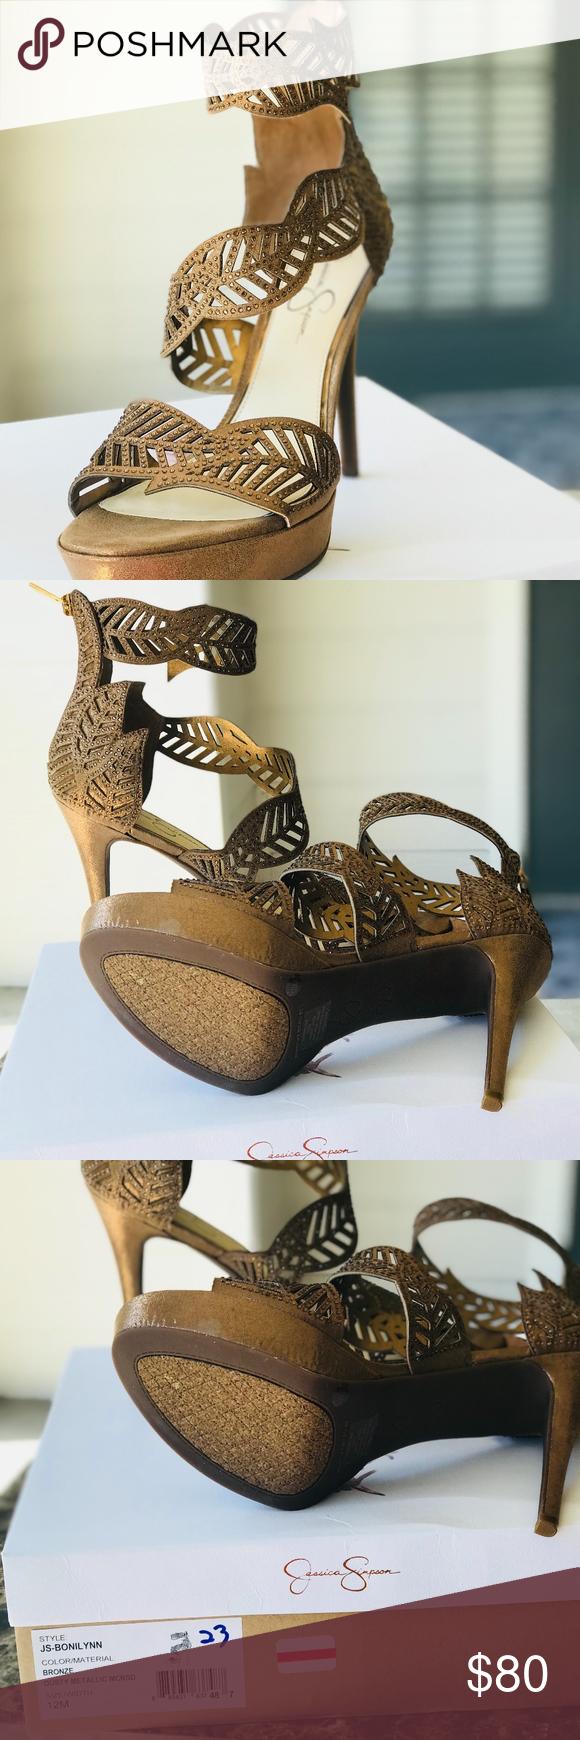 8b4454914d3 Jessica Simpson Bronze Metallic High Heels Size 12 Jessica Simpson Women s  Bonilynn Heeled Sandal Brand new